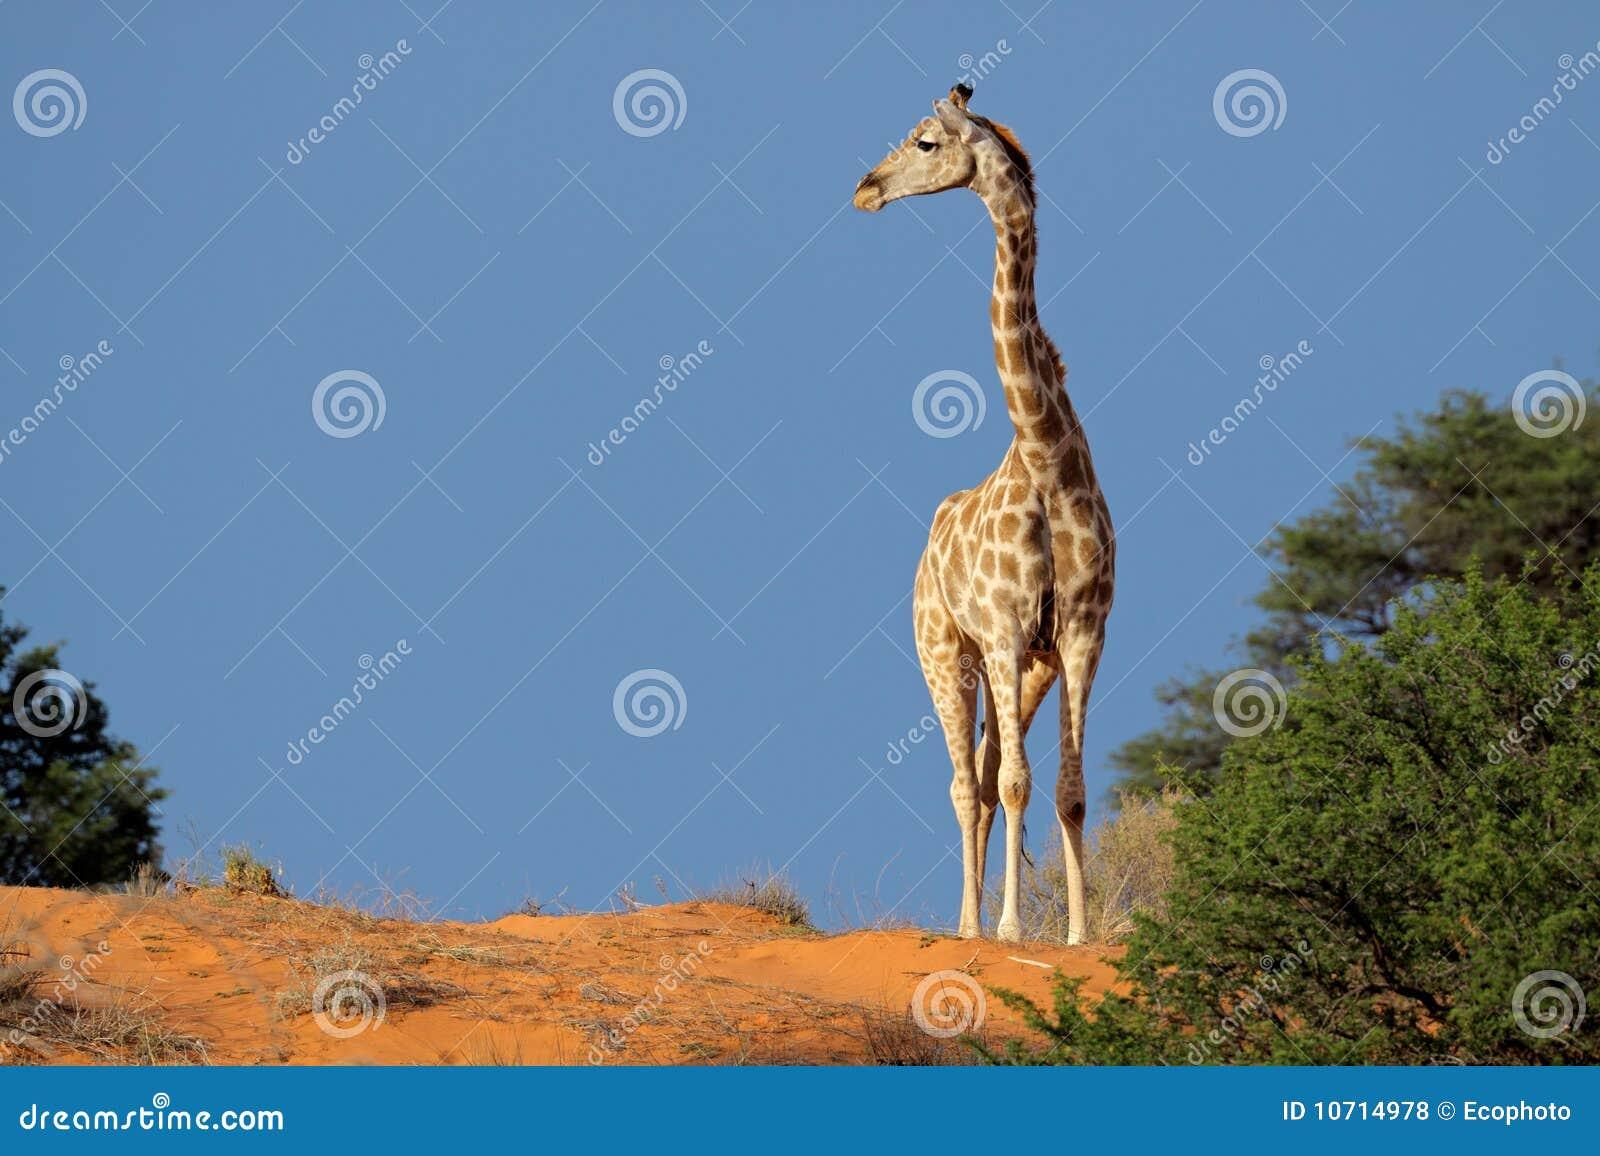 Africa ökengiraff södra kalahari